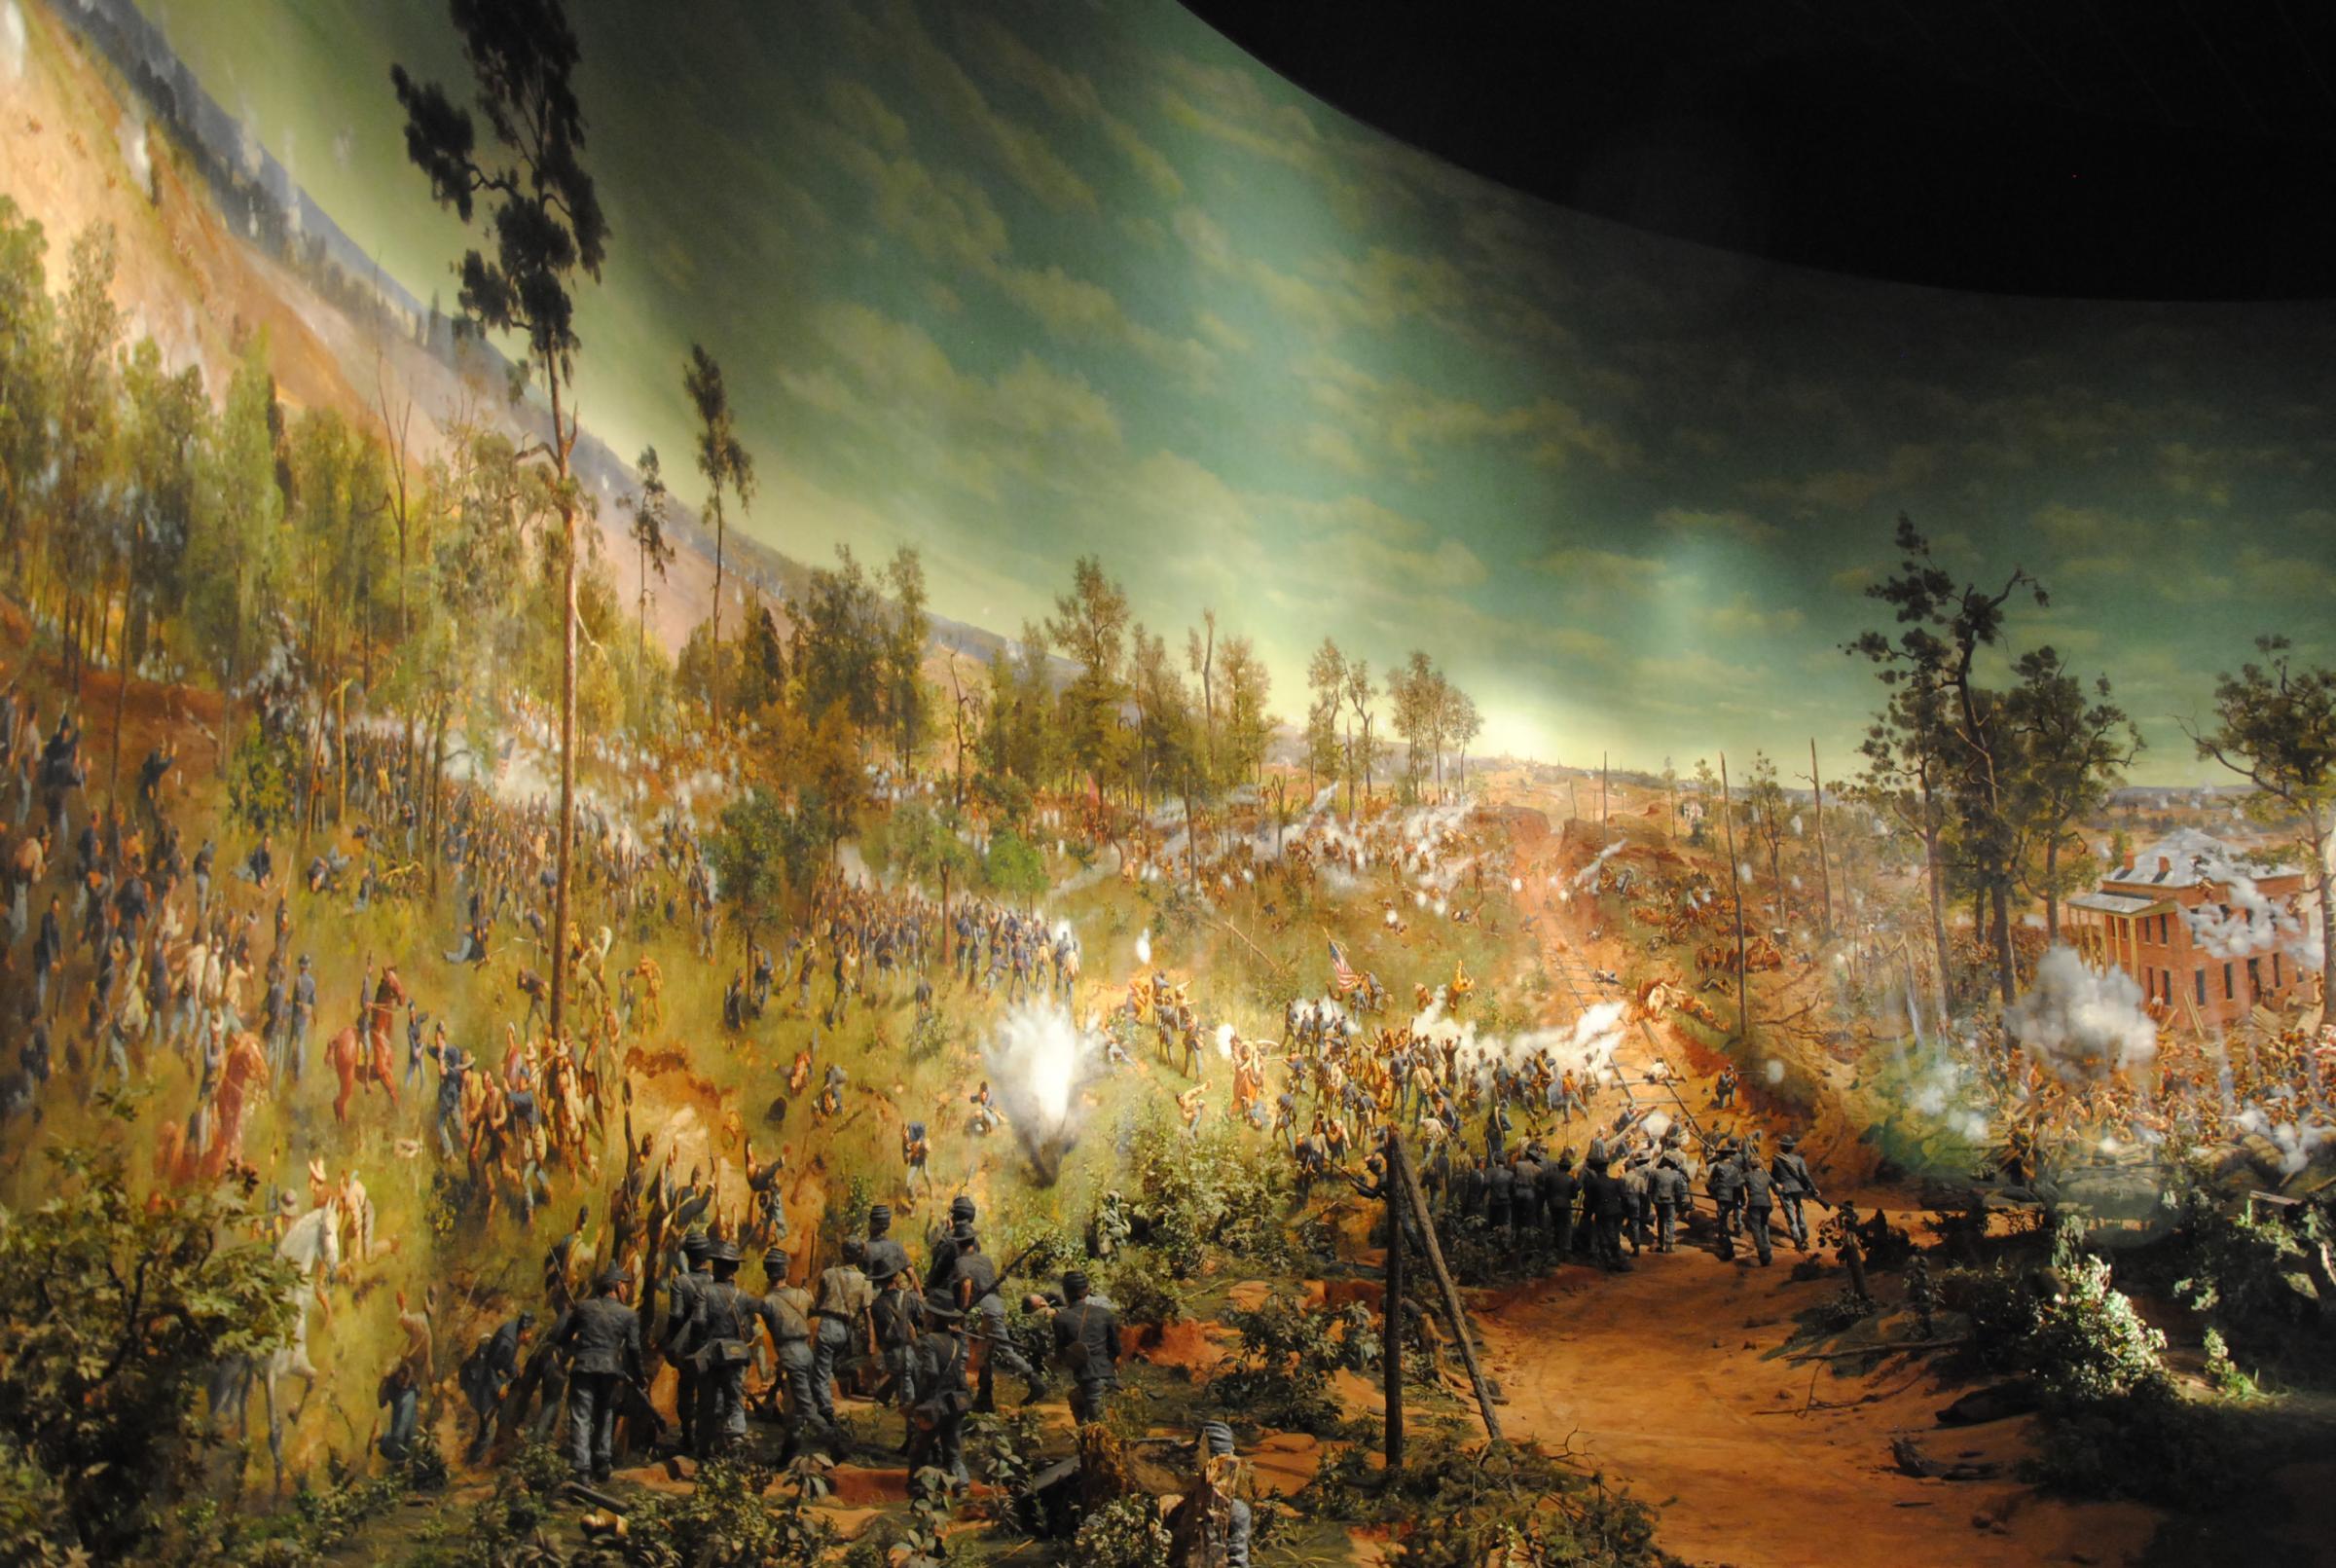 Motion picture moving atlanta 39 s massive civil war for Atlanta mural artist